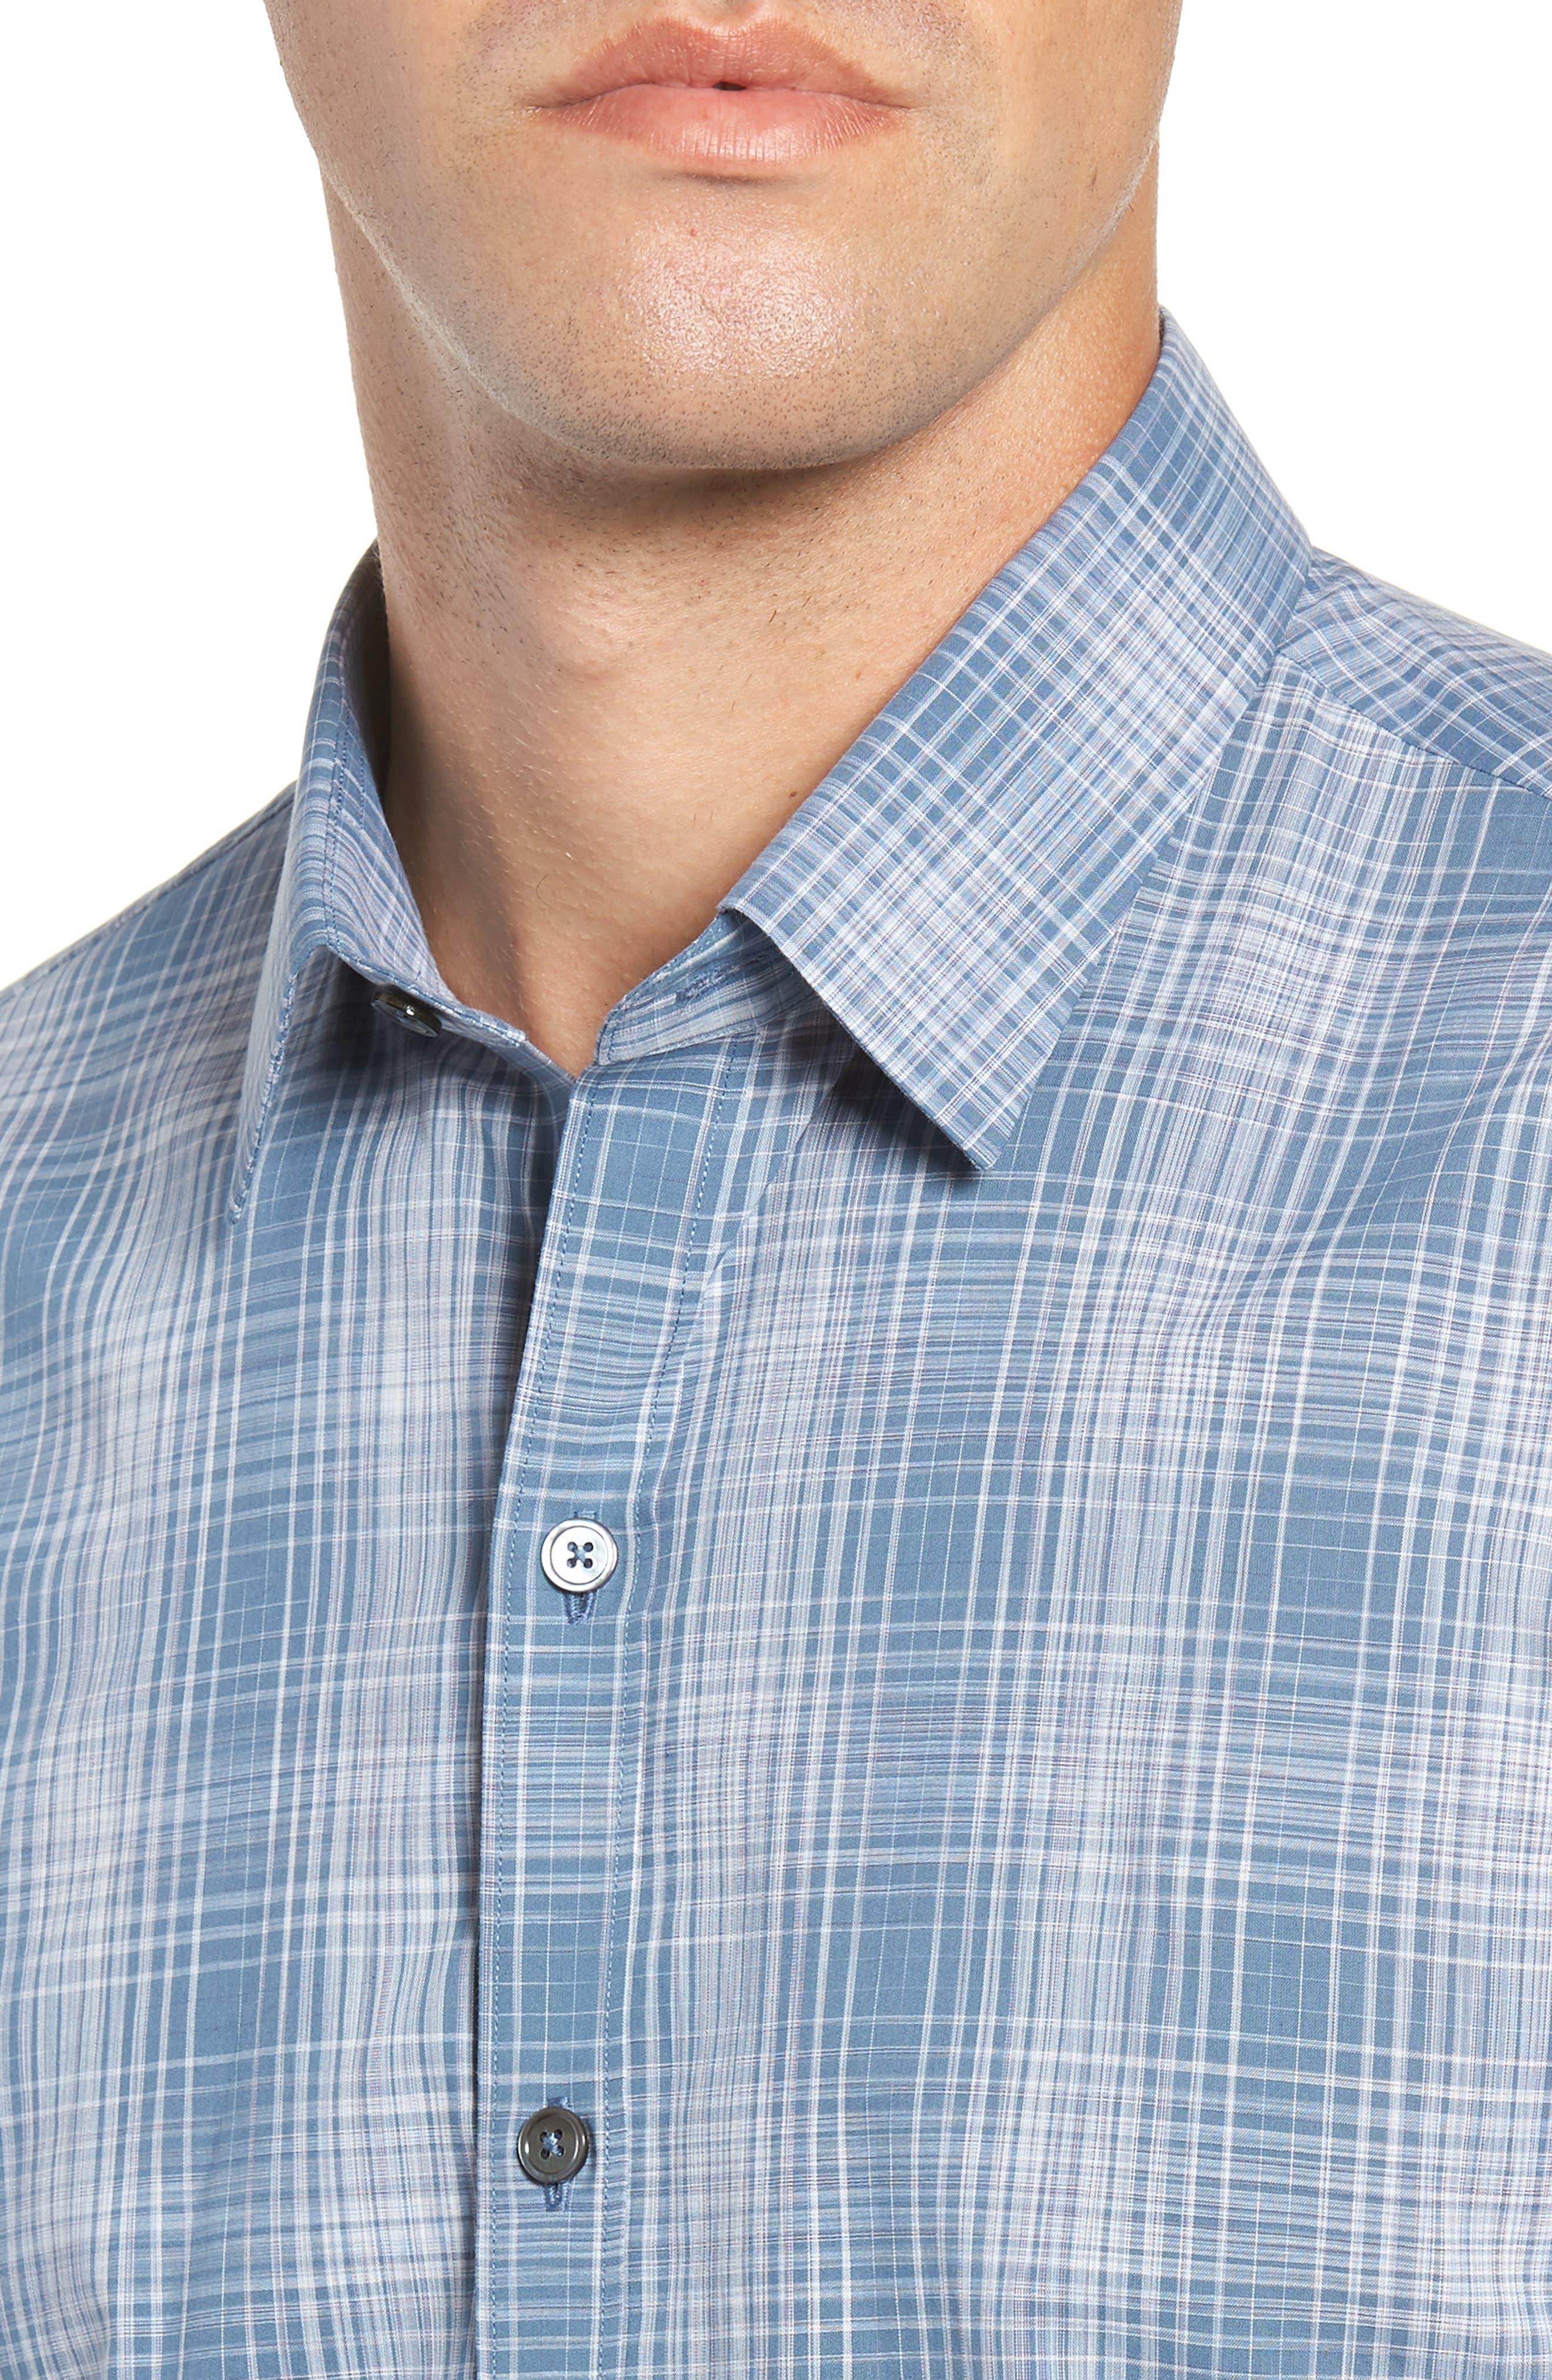 Slater Check Sport Shirt,                             Alternate thumbnail 2, color,                             PALE BLUE